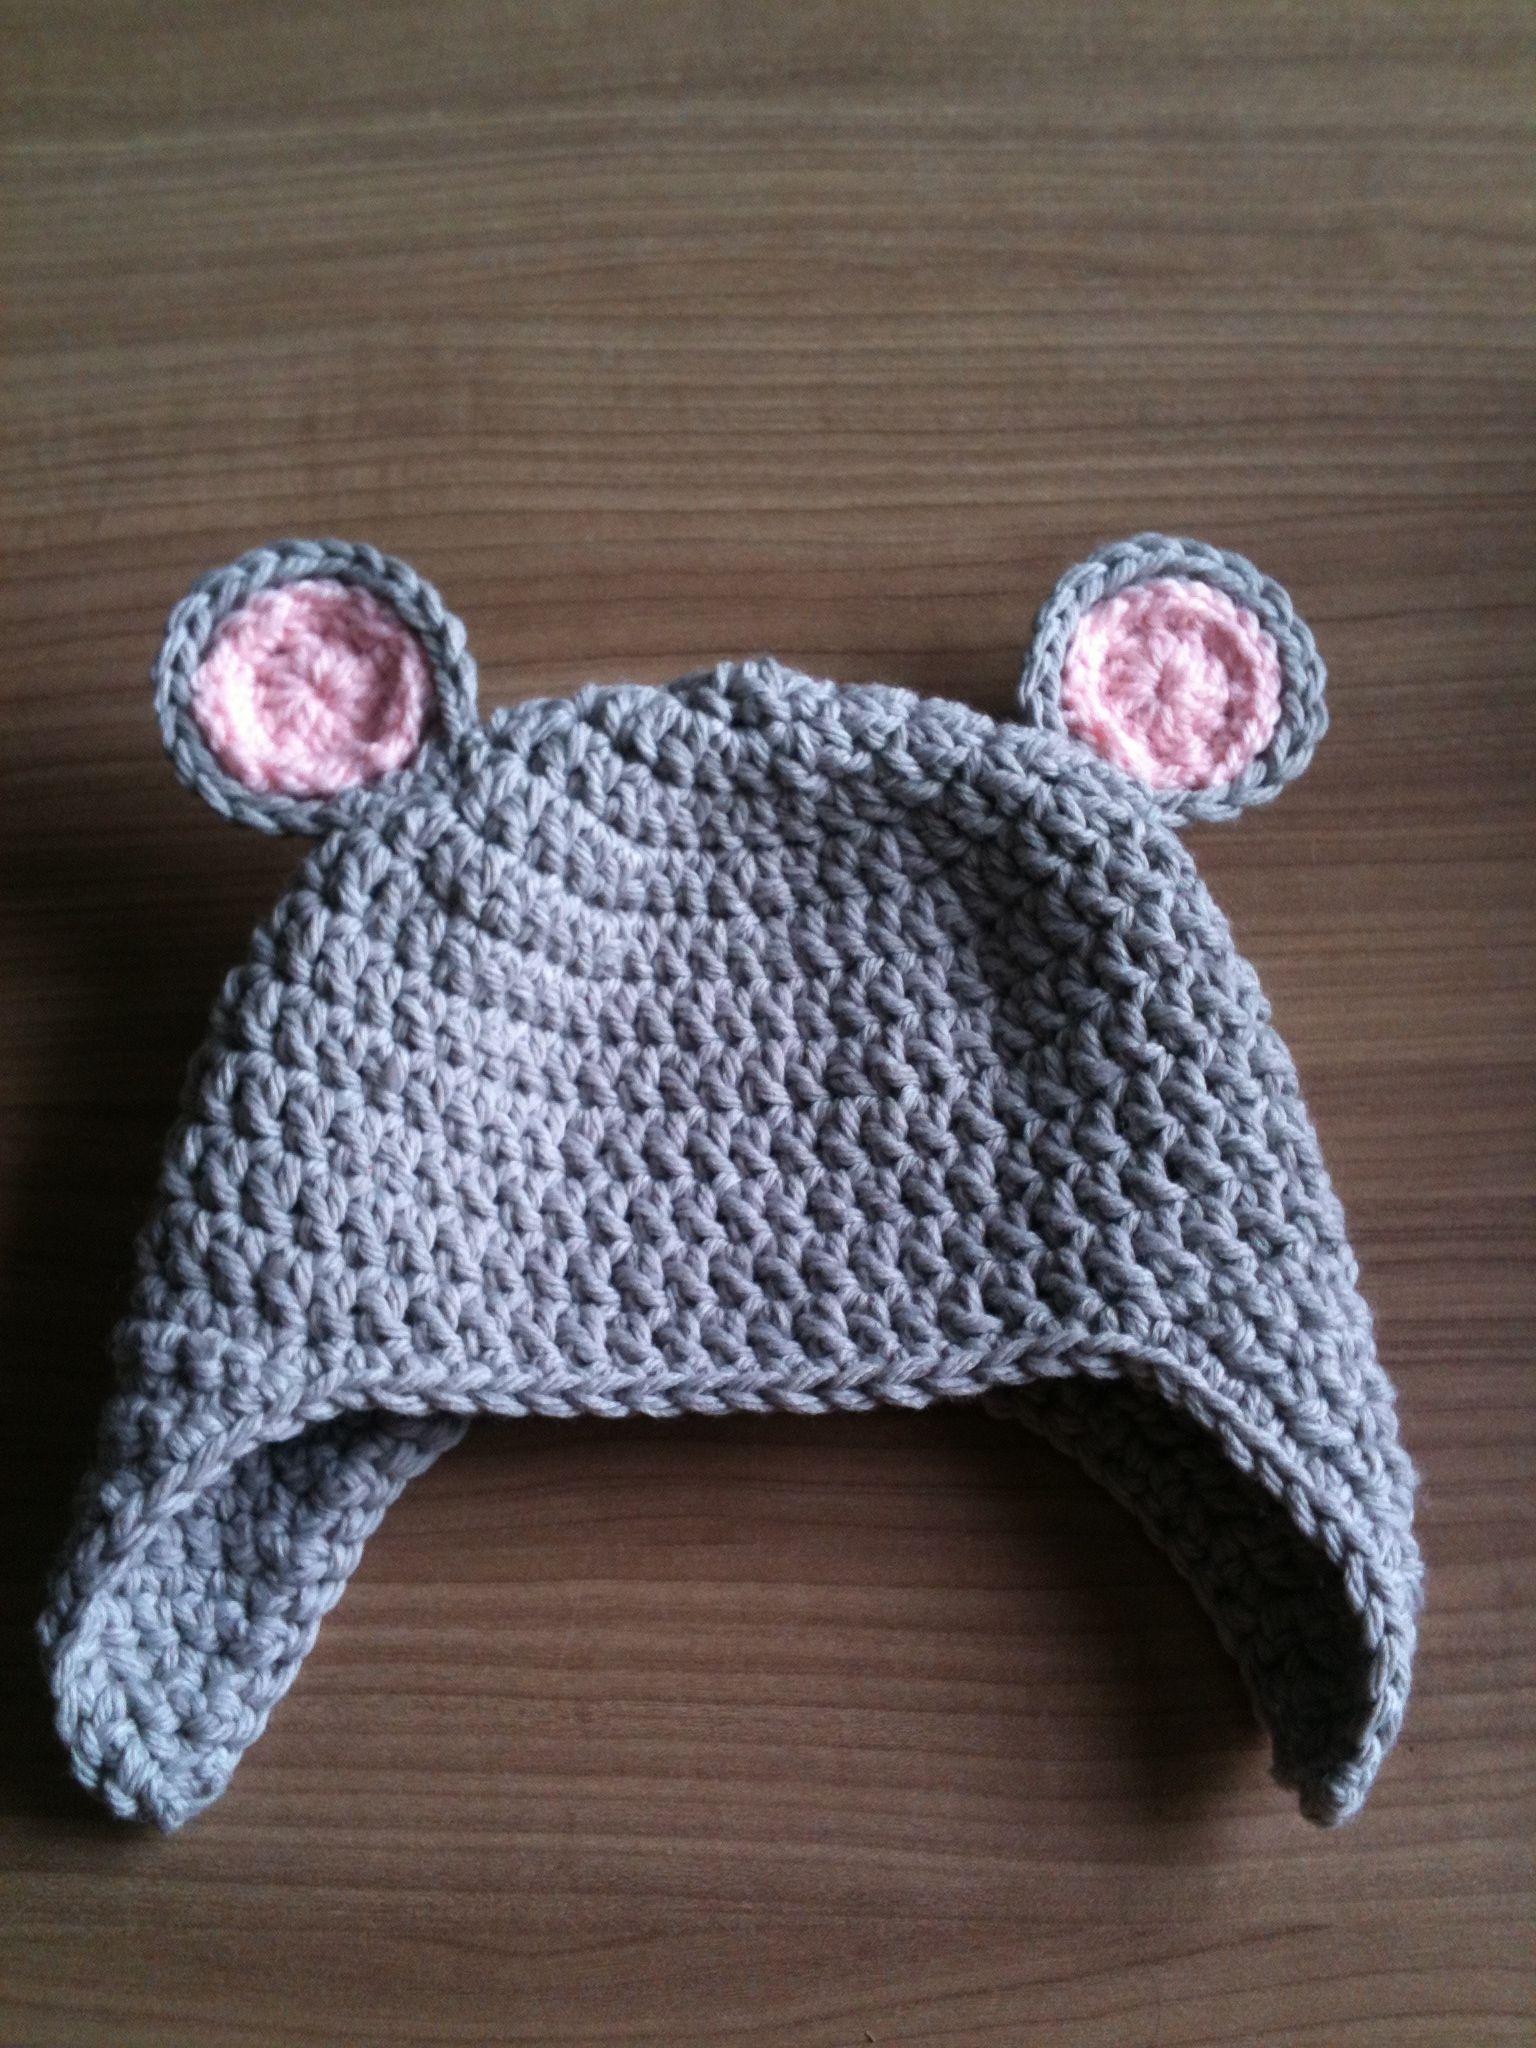 Crochet Mouse Hat Own Creations Crochet Crochet Mouse Hats